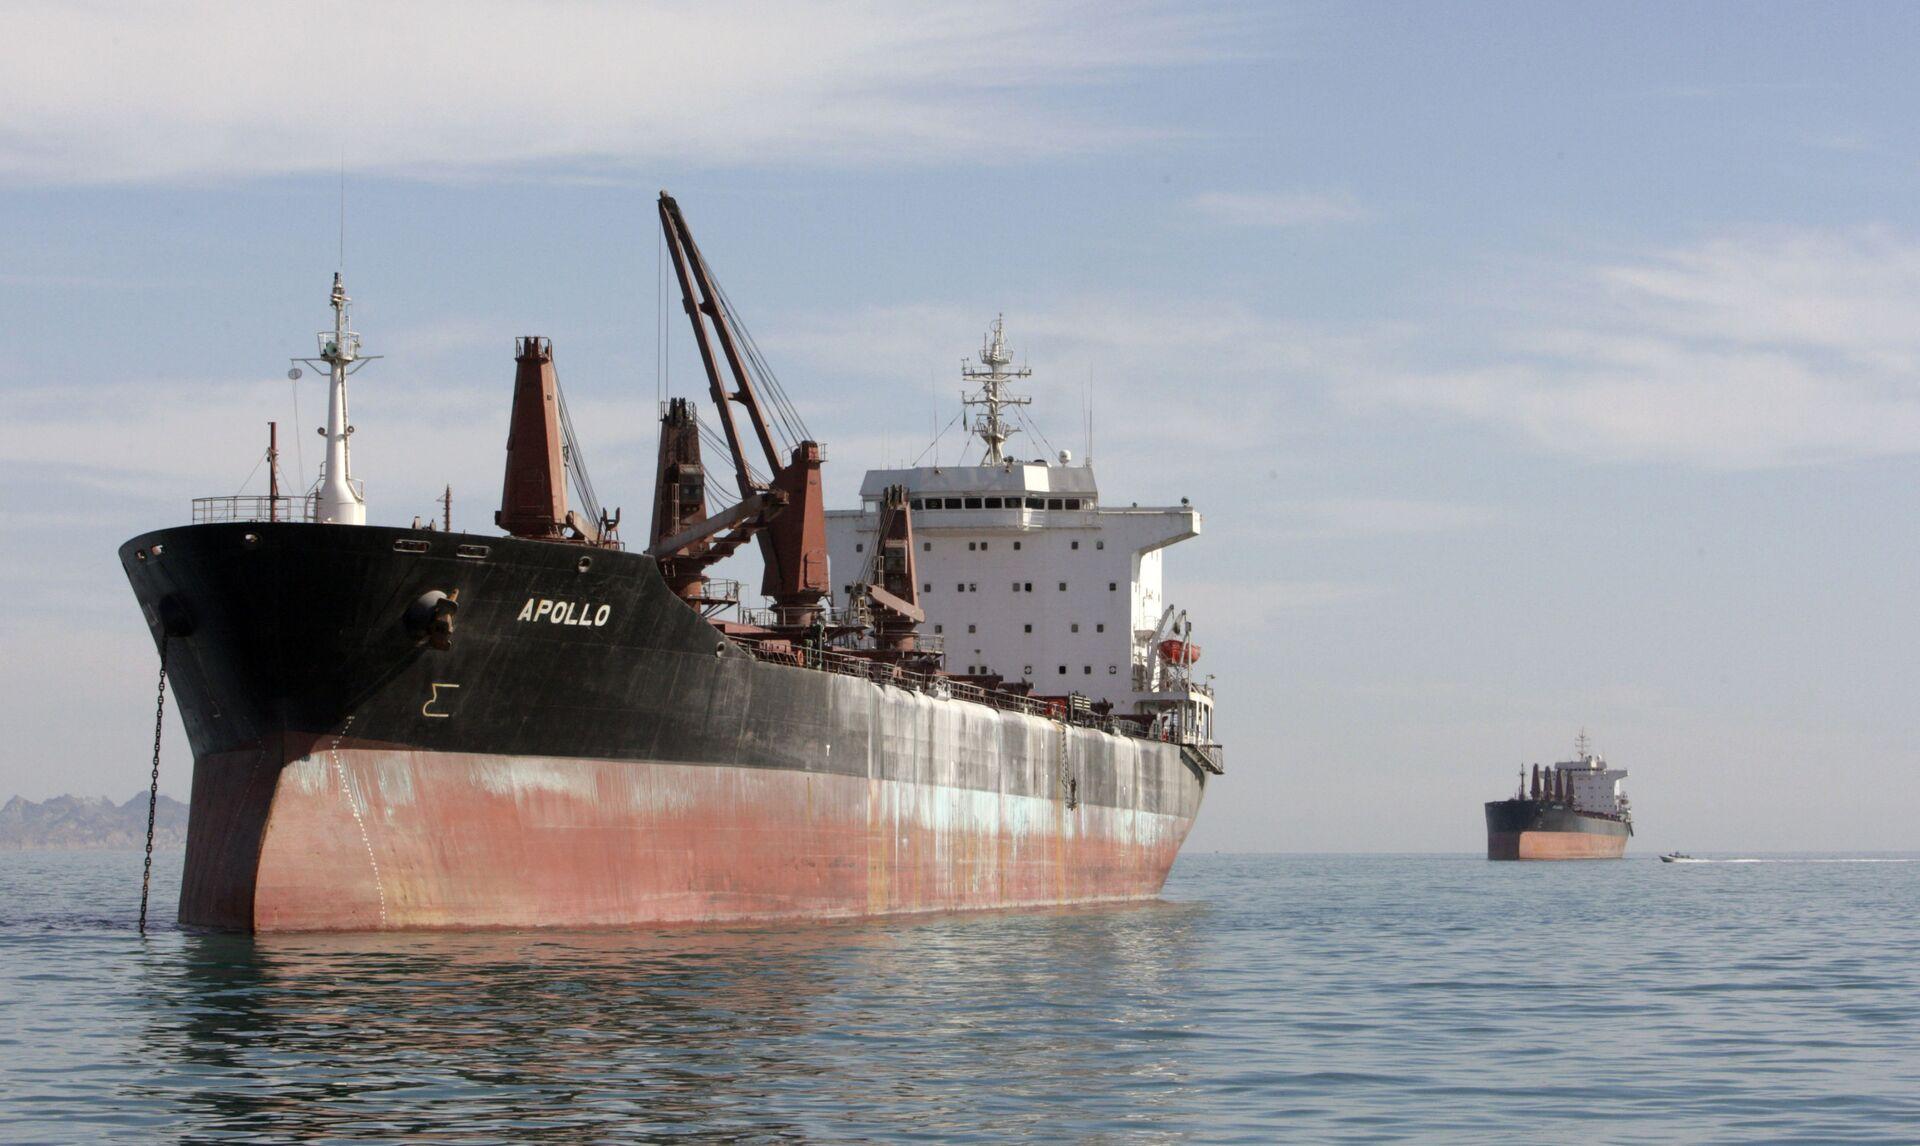 NYT: Israel Struck Iranian Vessel Saviz in Red Sea, Notified US - Sputnik International, 1920, 07.04.2021